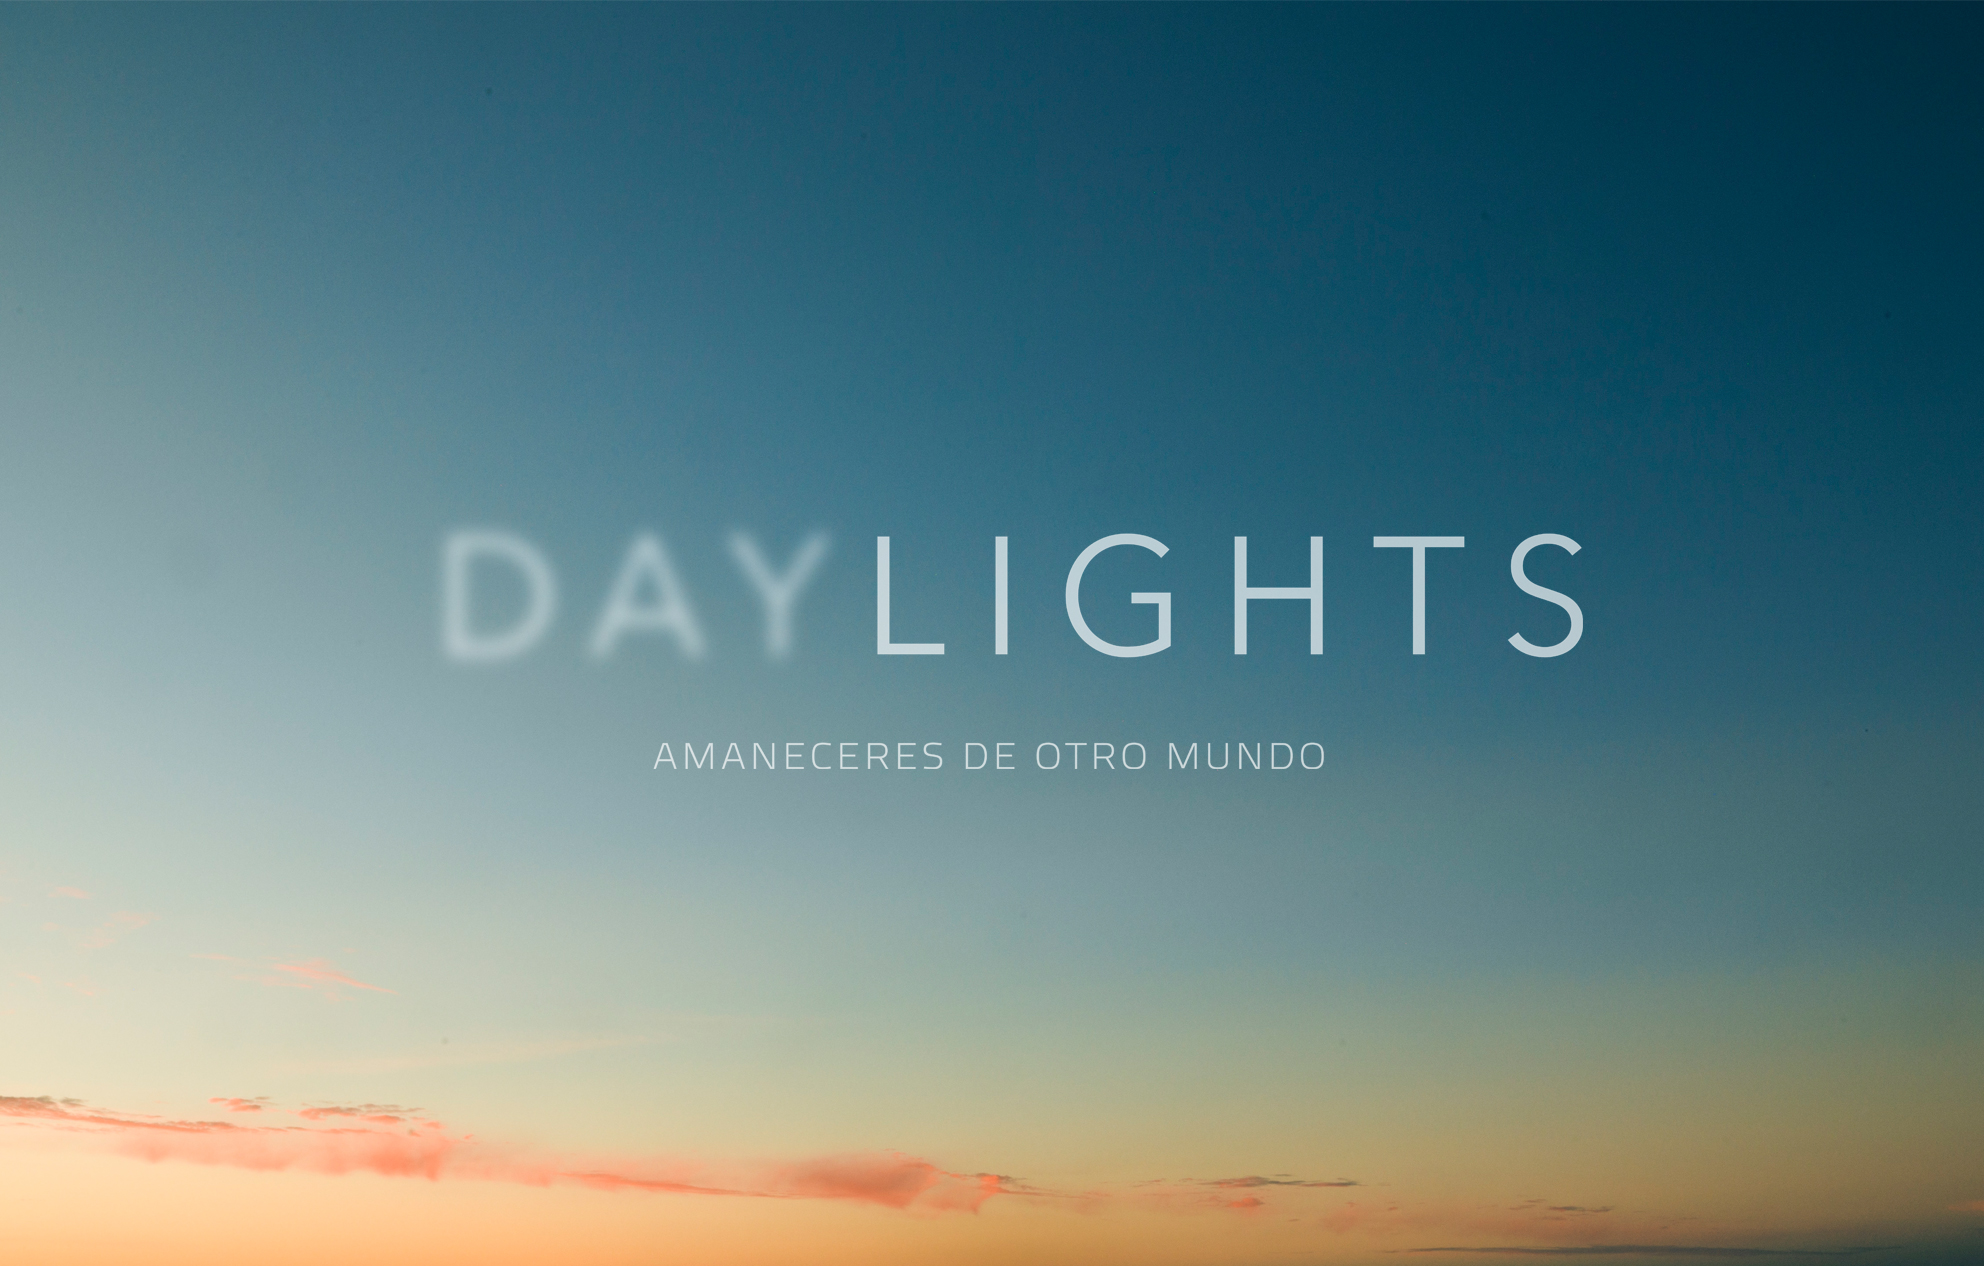 daylights_3